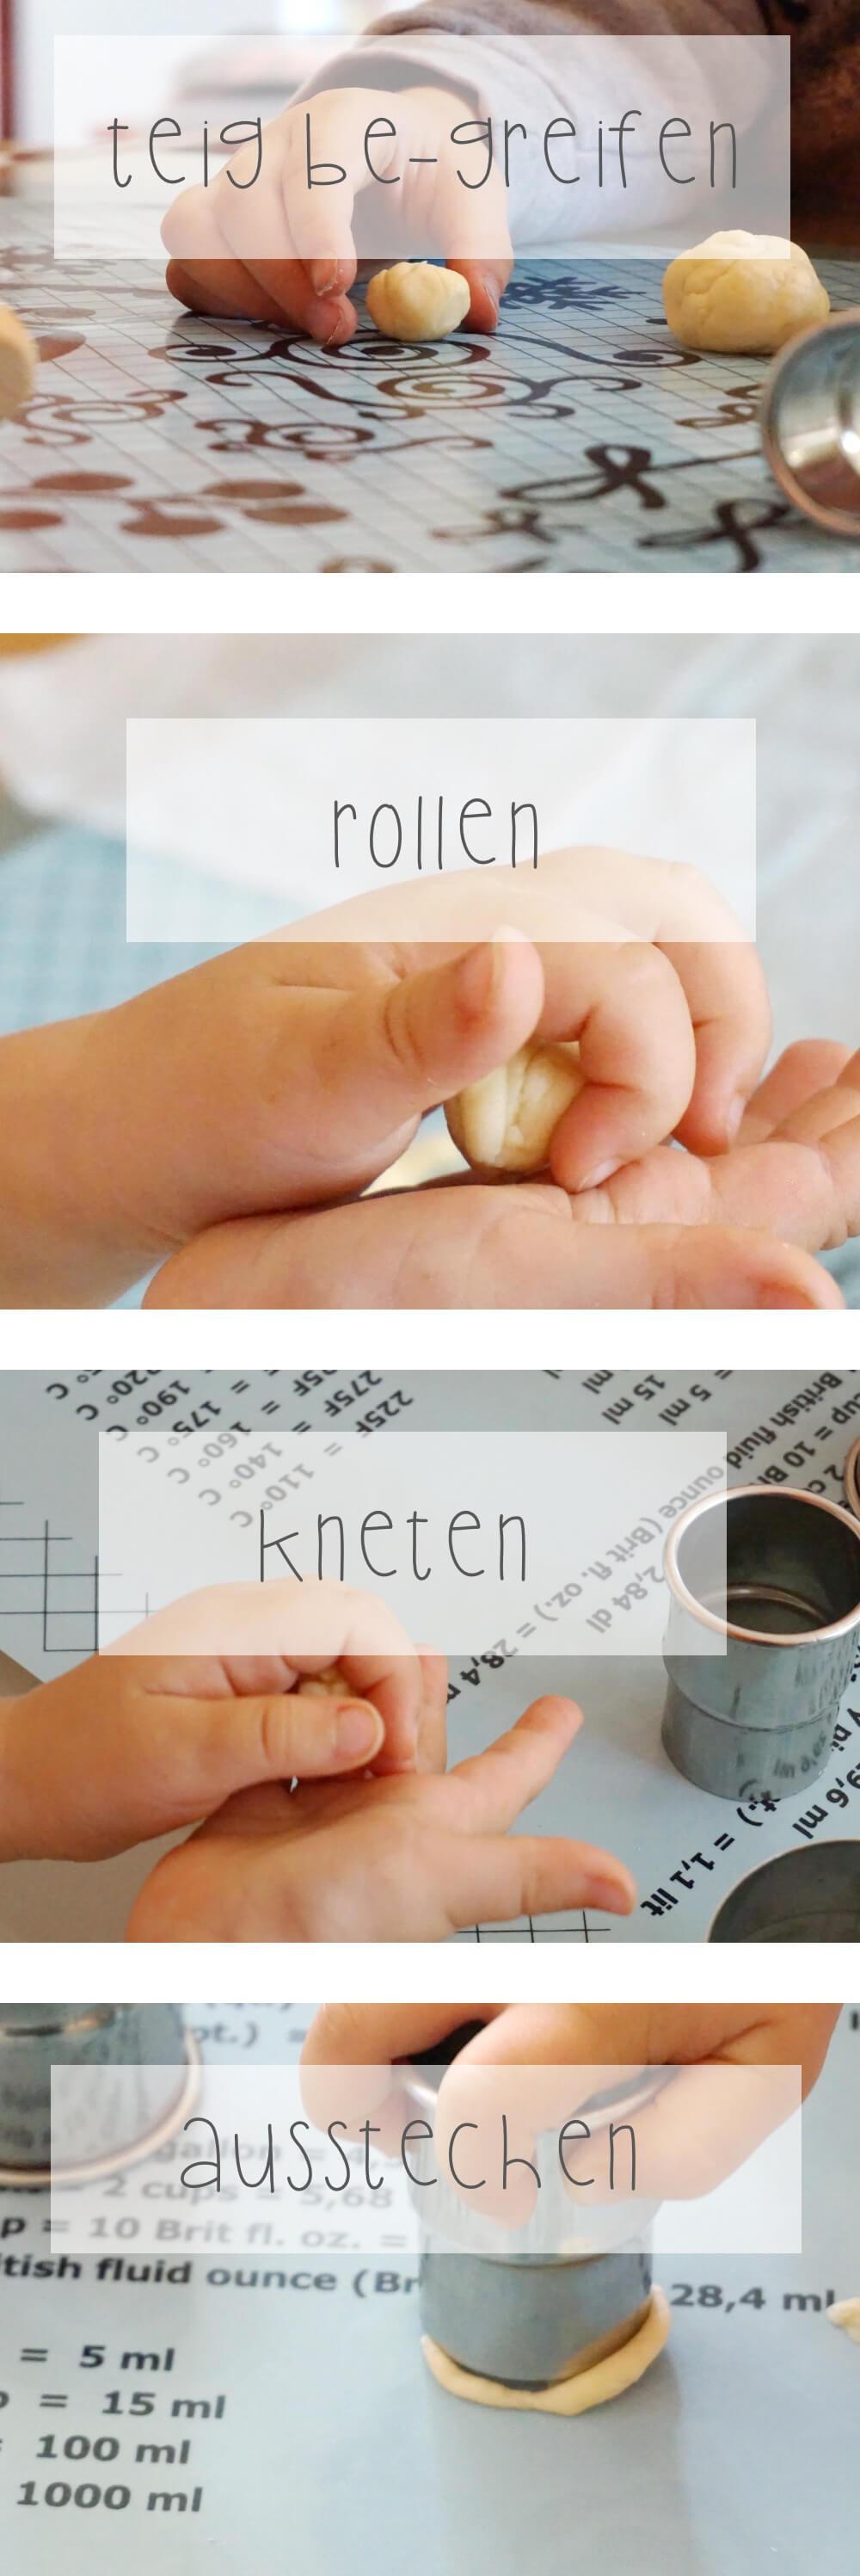 knetmasse oder teig formen